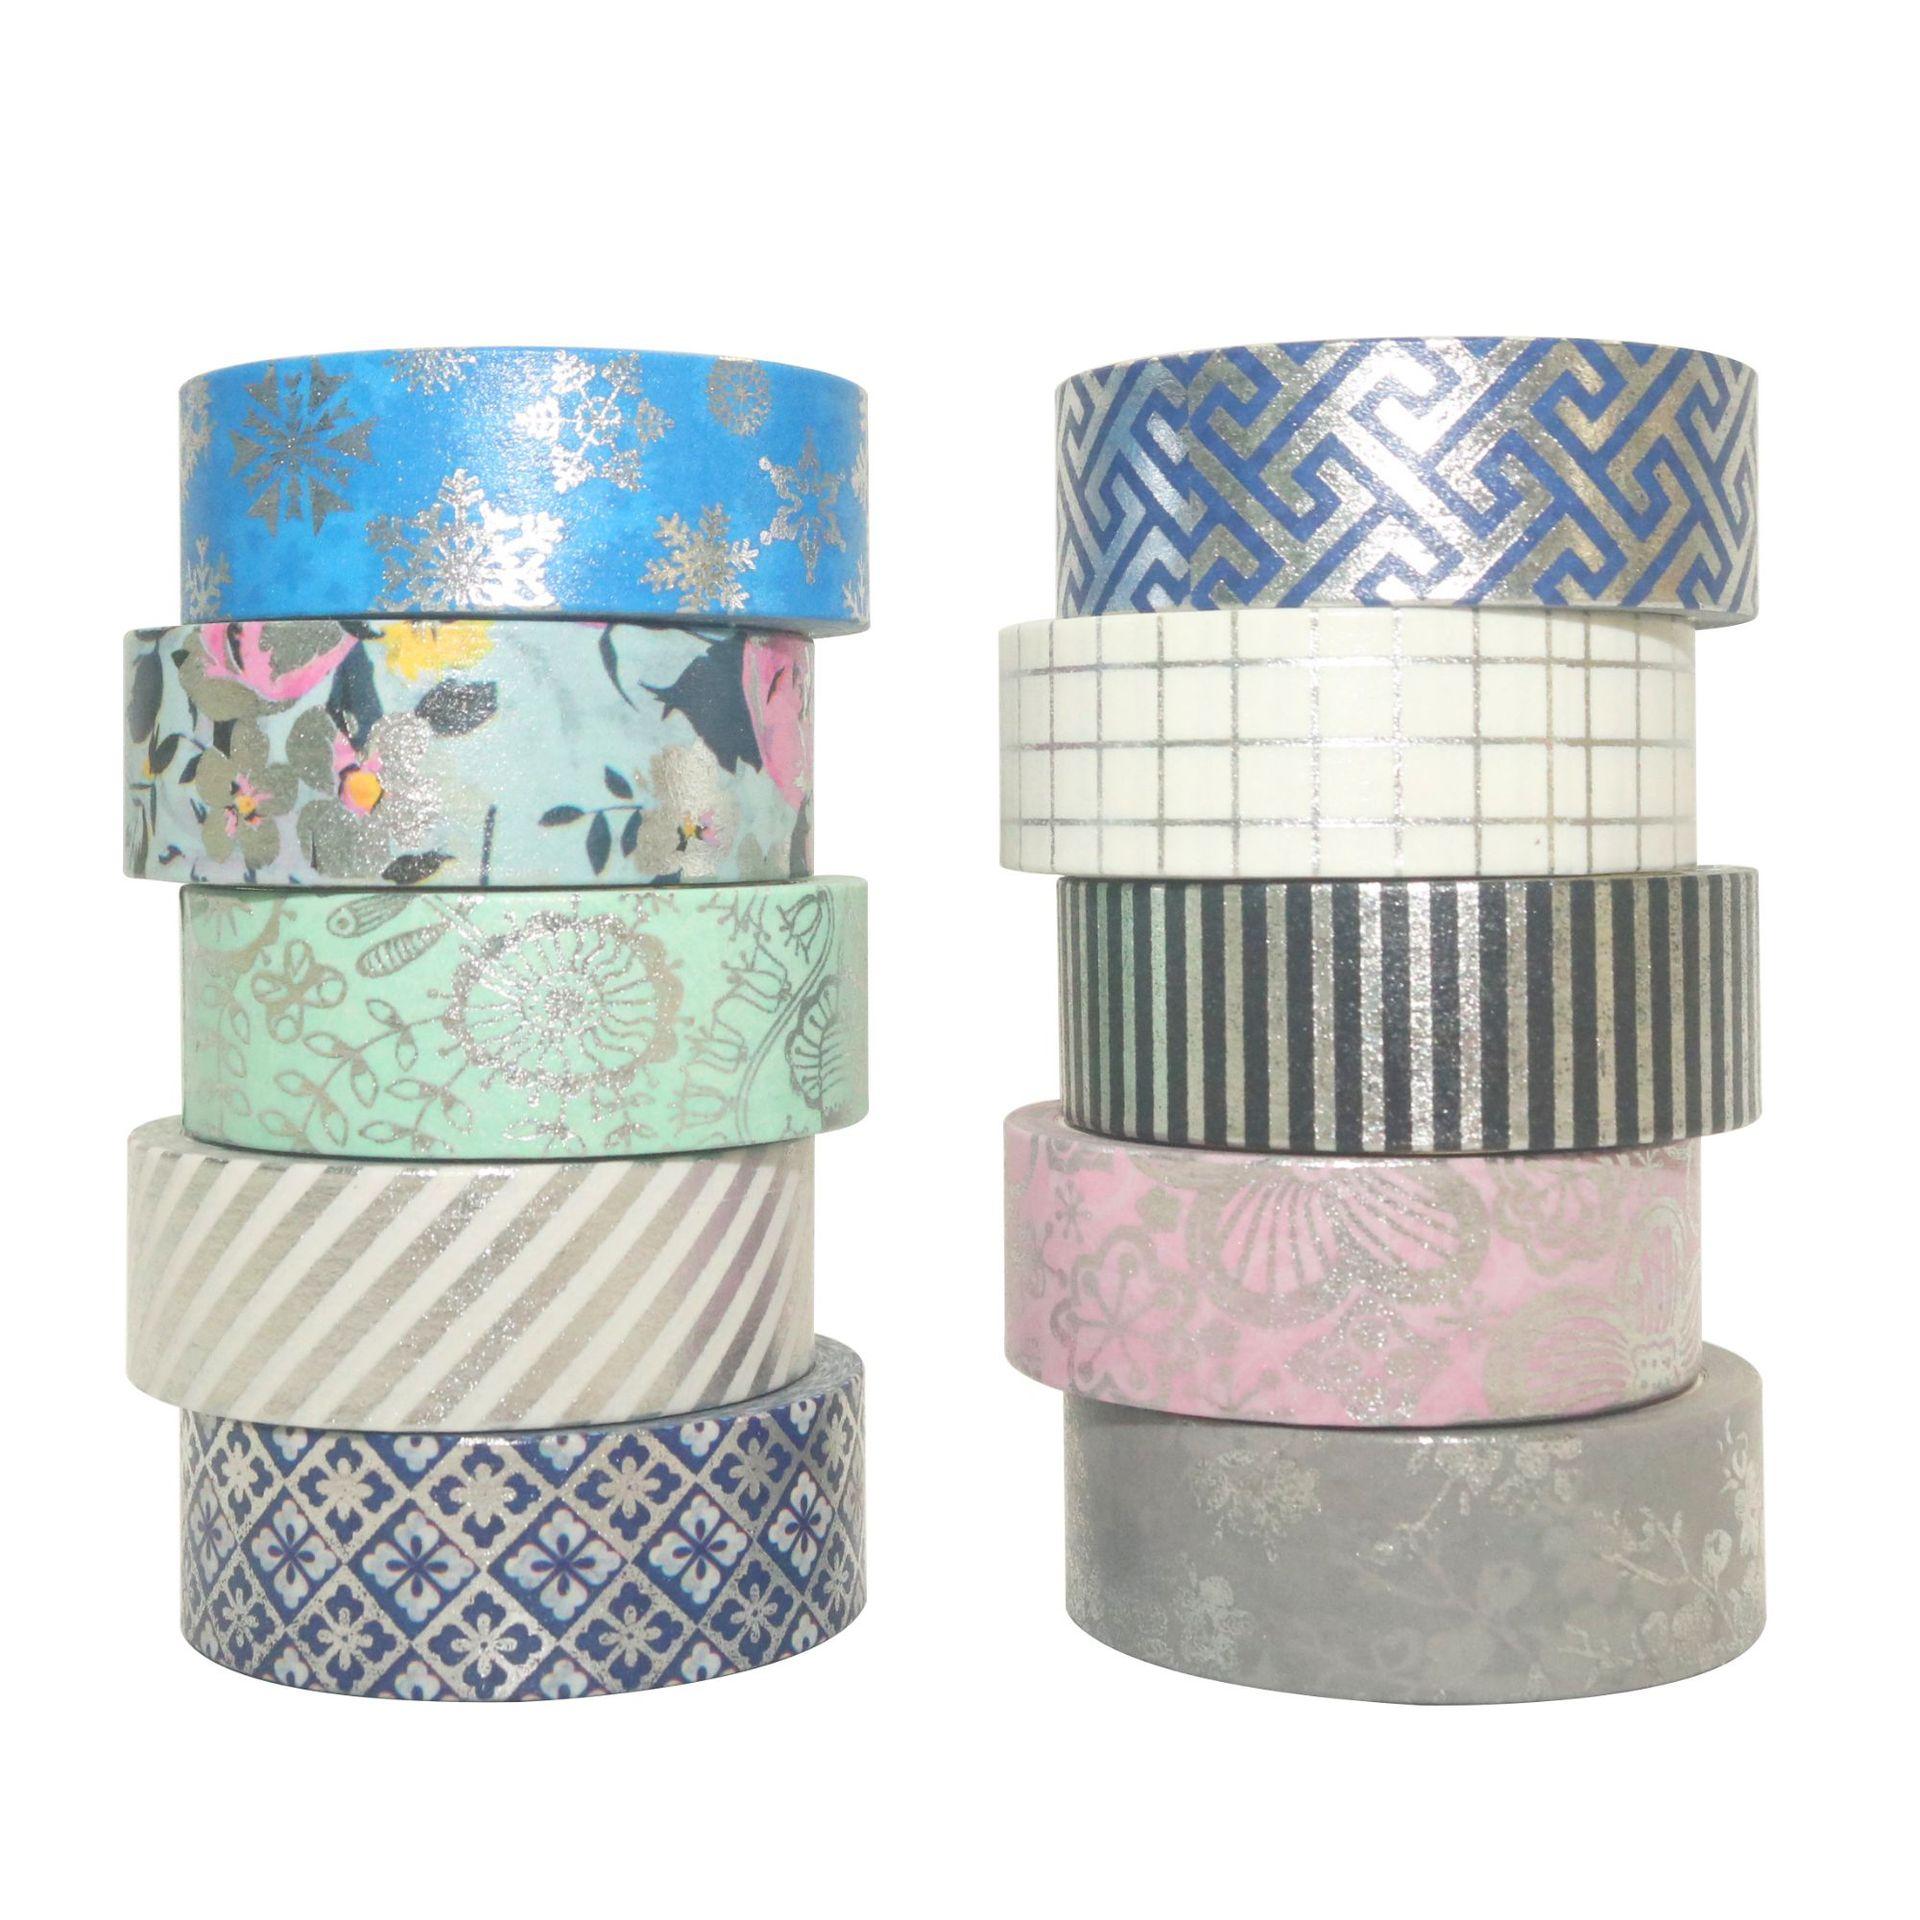 10Rolls/Set Silver Foil Washi Tape Set Paper Festival DIY Scrapbooking Adhesive Masking Tape Decorative Sticky Washi Tape Gift